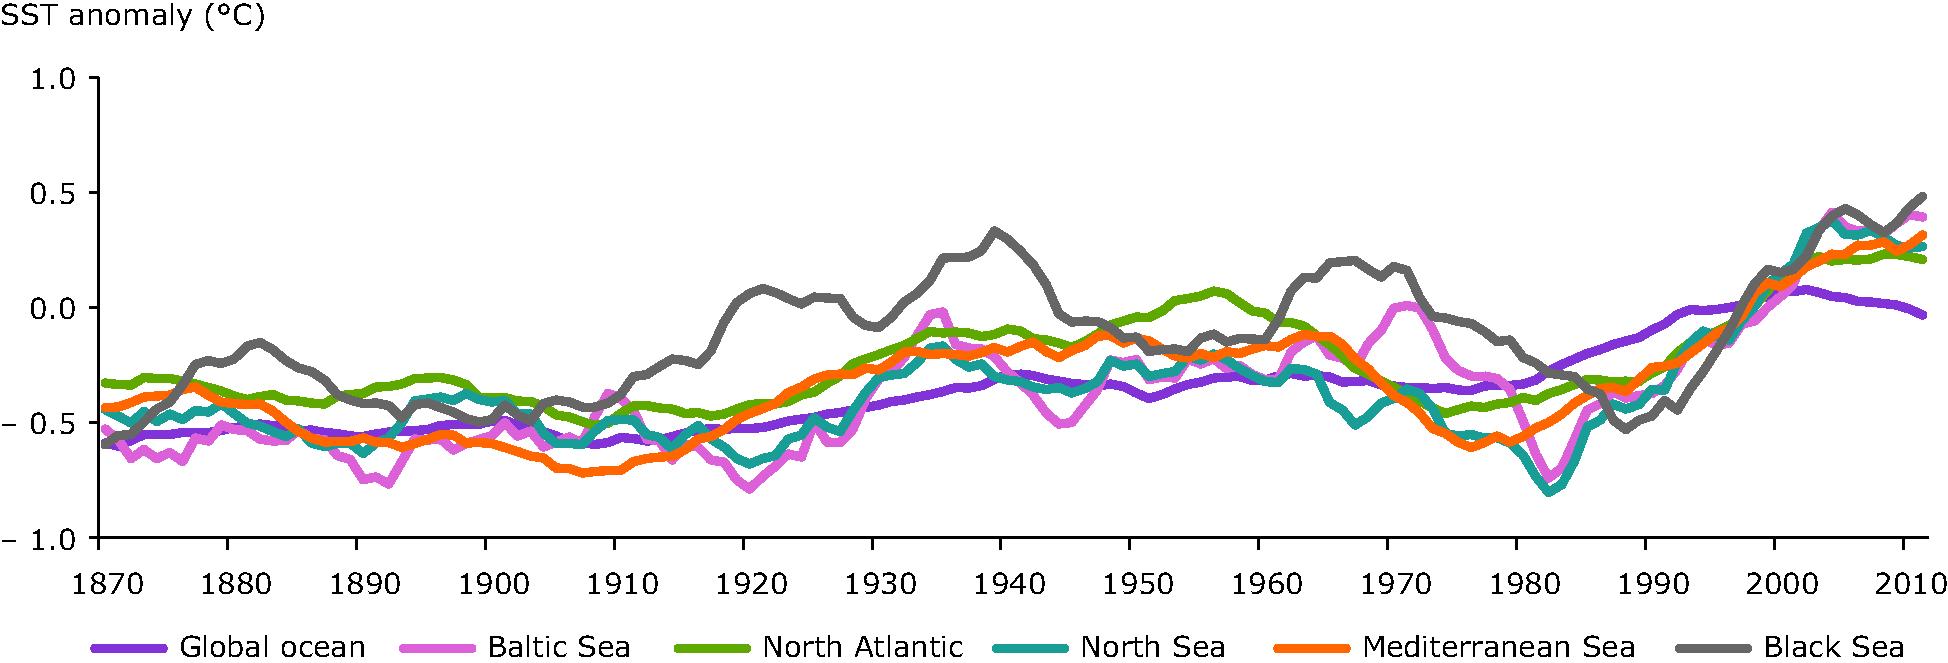 Annual average sea surface temperature anomaly in different European seas